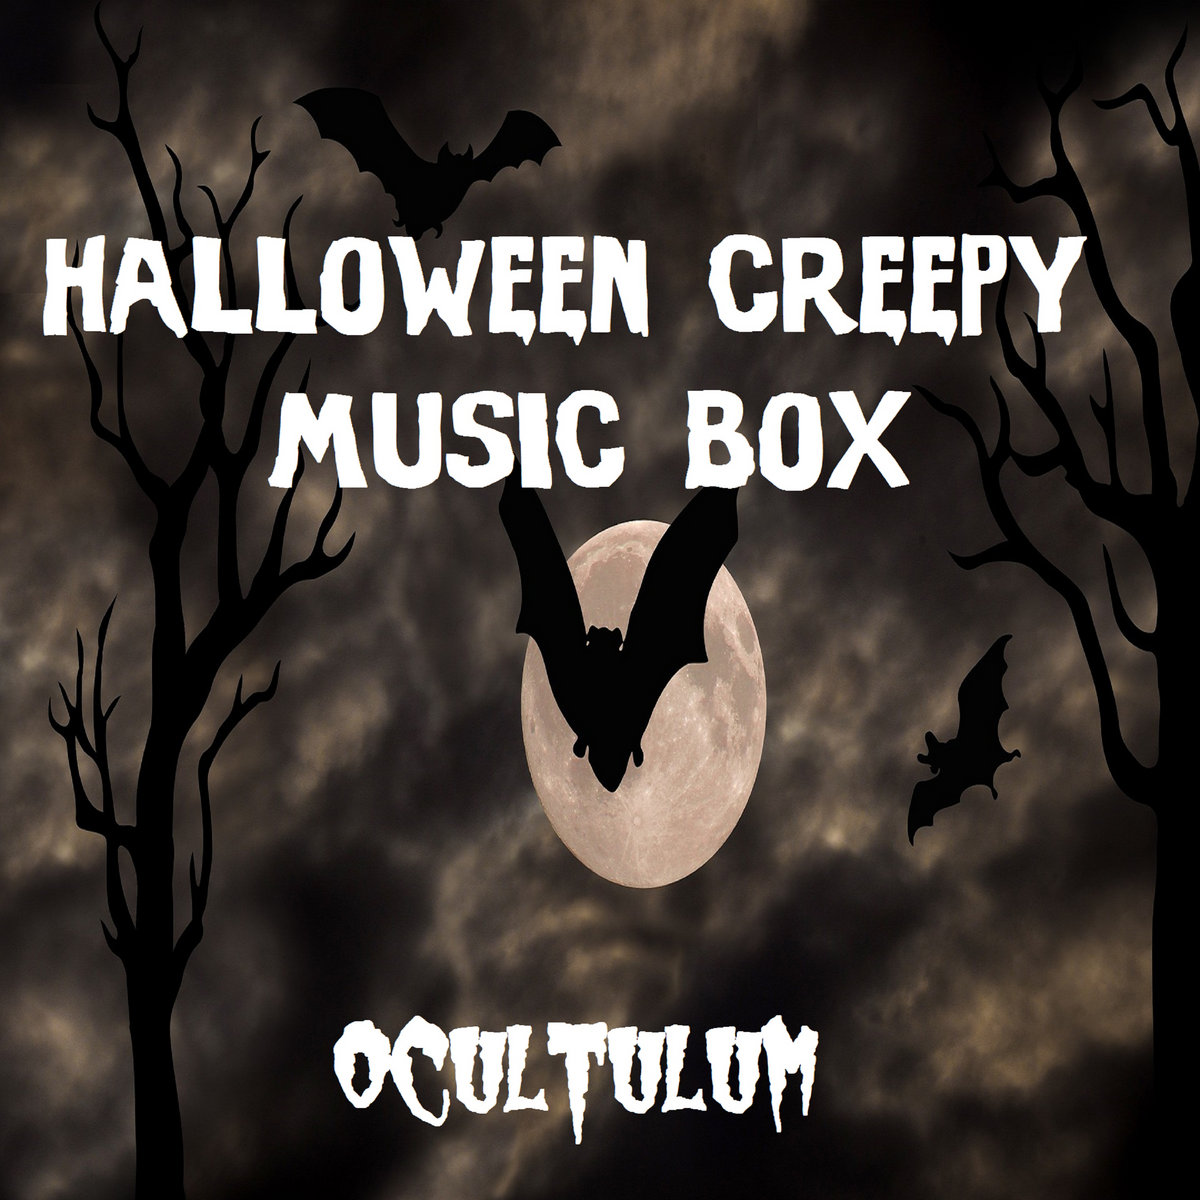 Halloween Creepy Music Box | Ocultulum